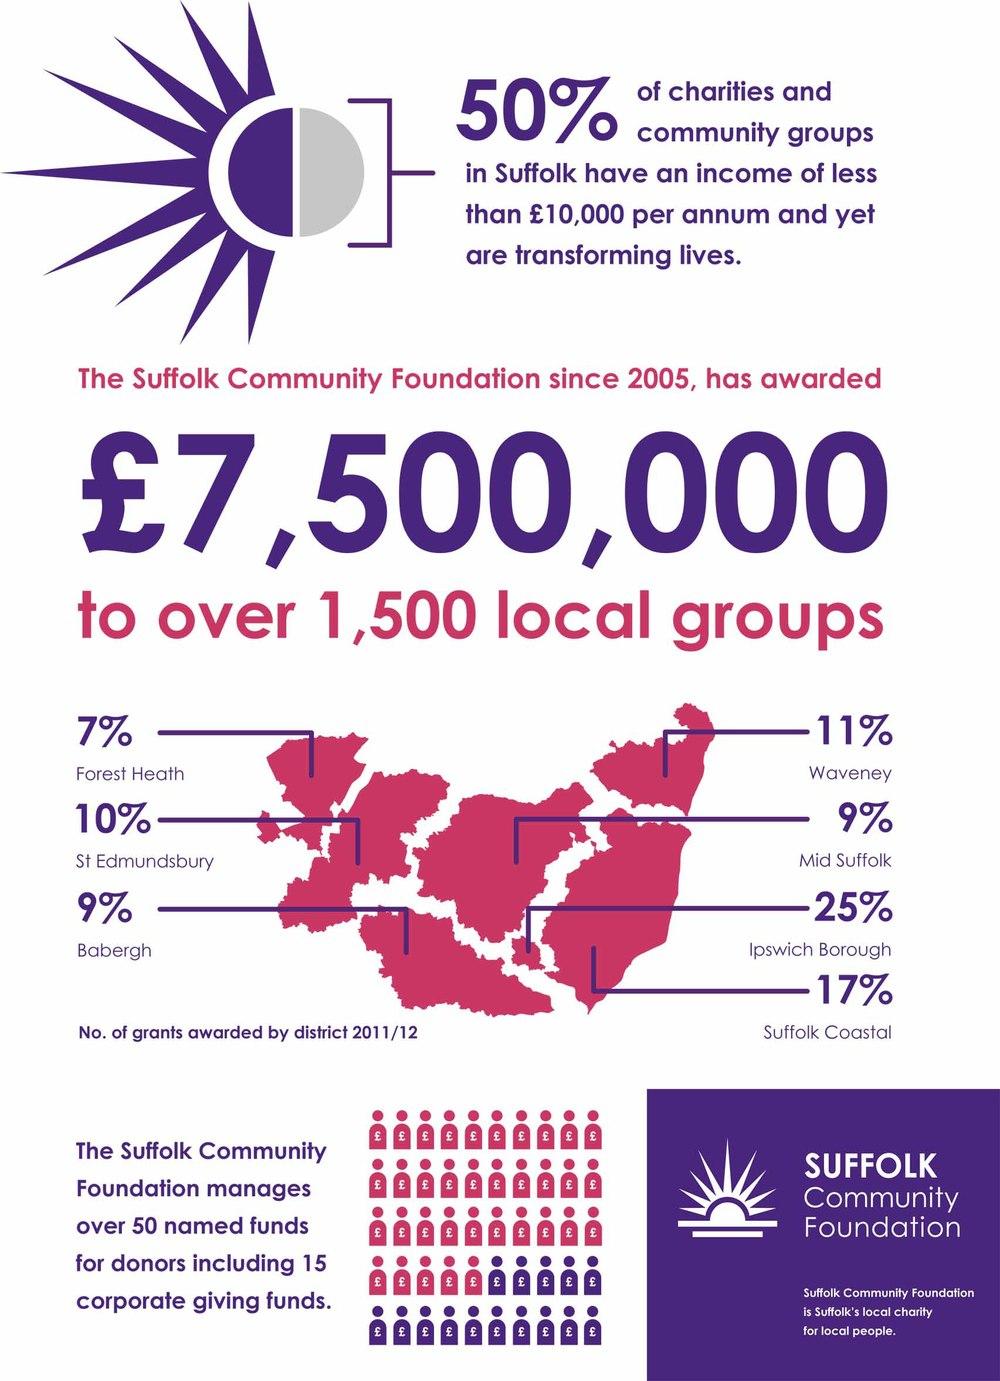 SG_Infographic 2 - Jun 2013.jpg